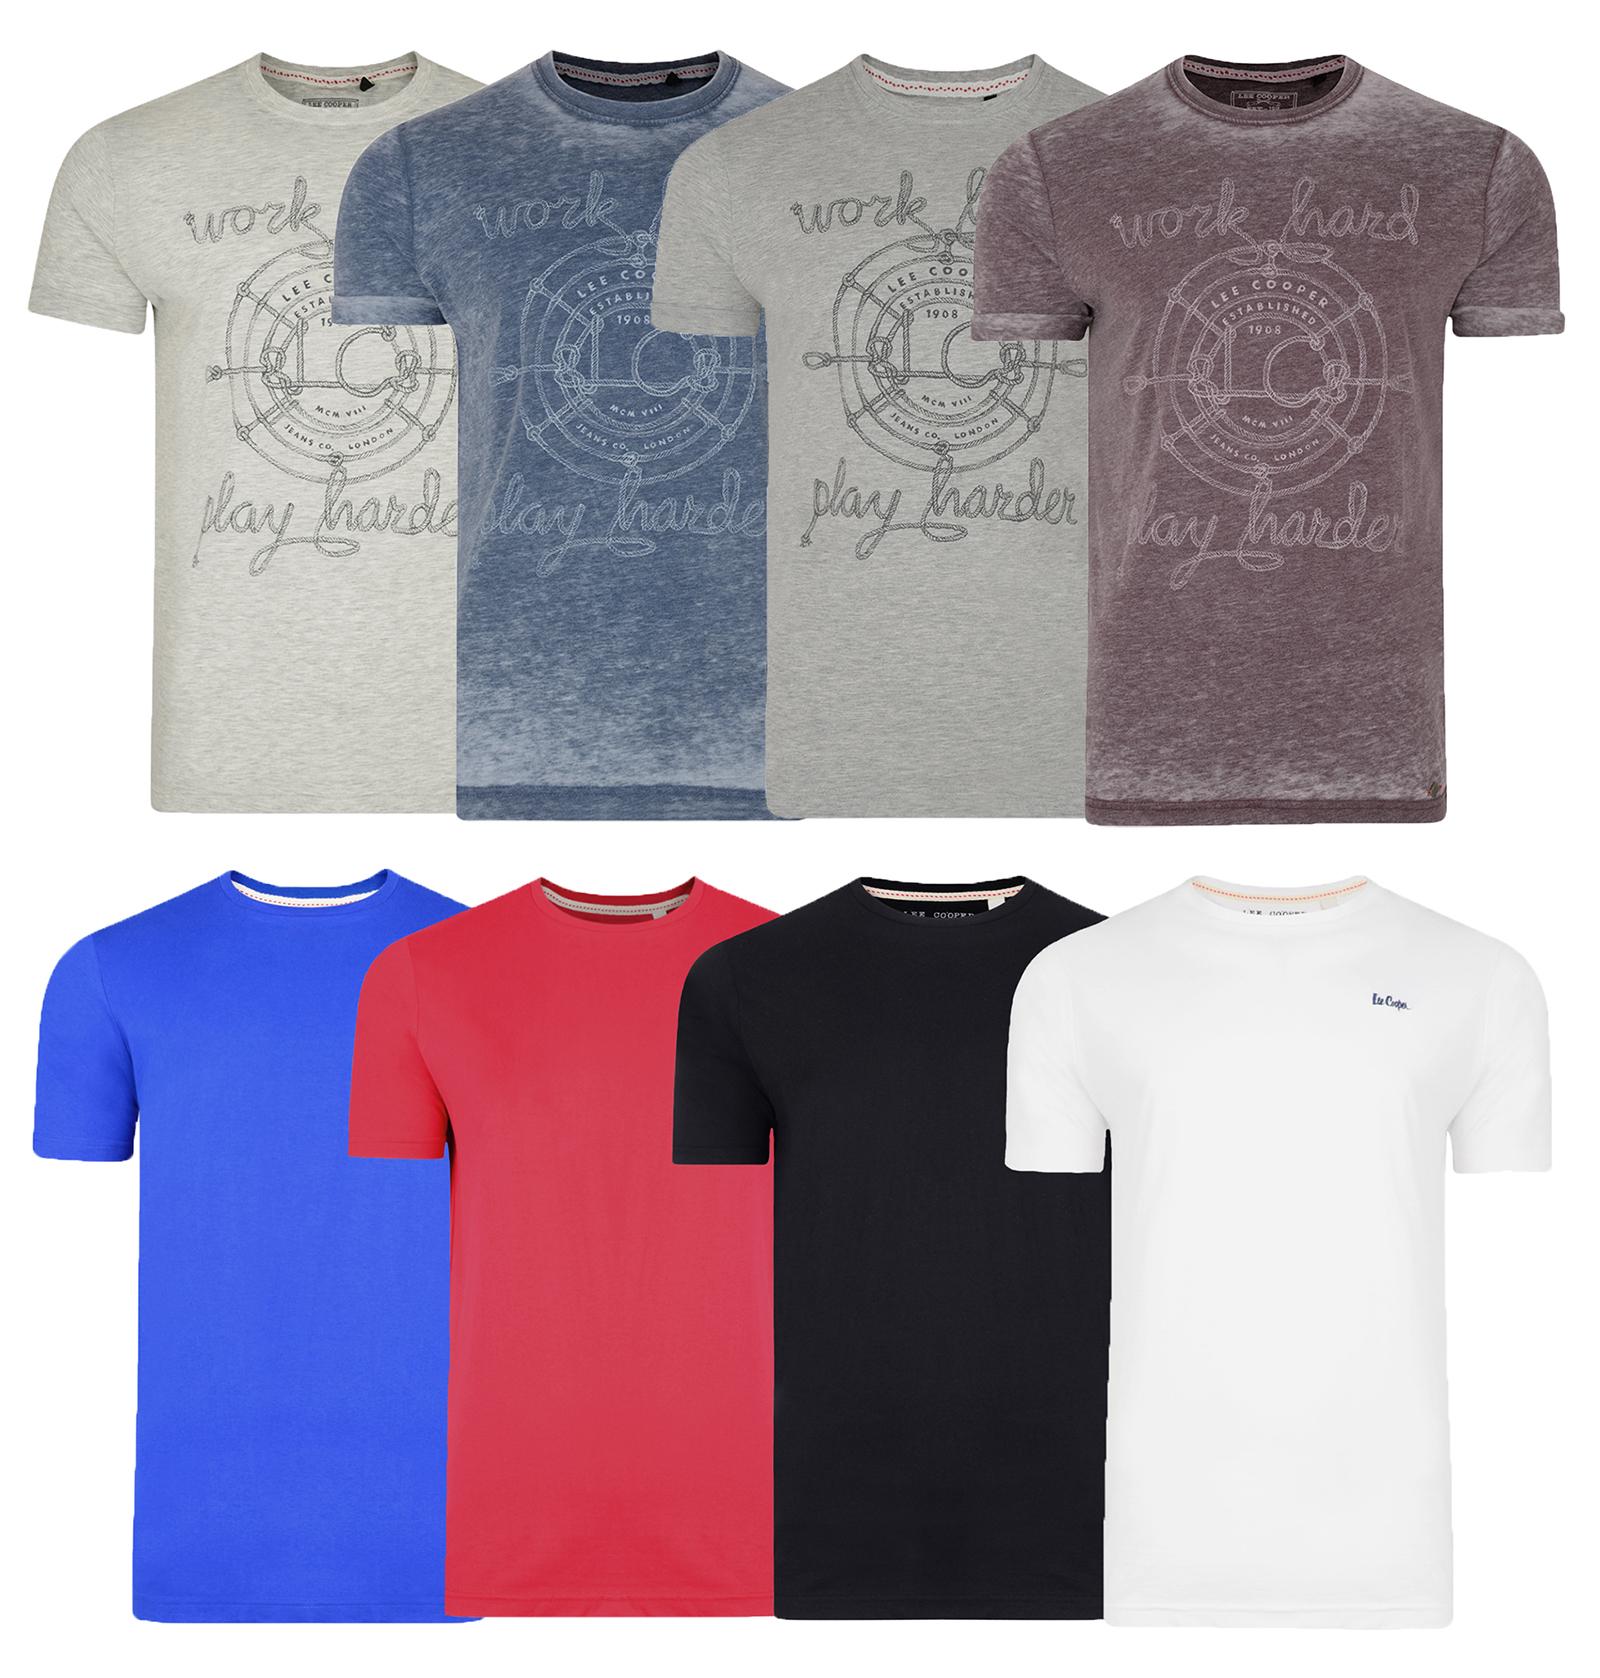 Lee cooper printed plain new men s t shirts cotton plain for Plain t shirts to print on